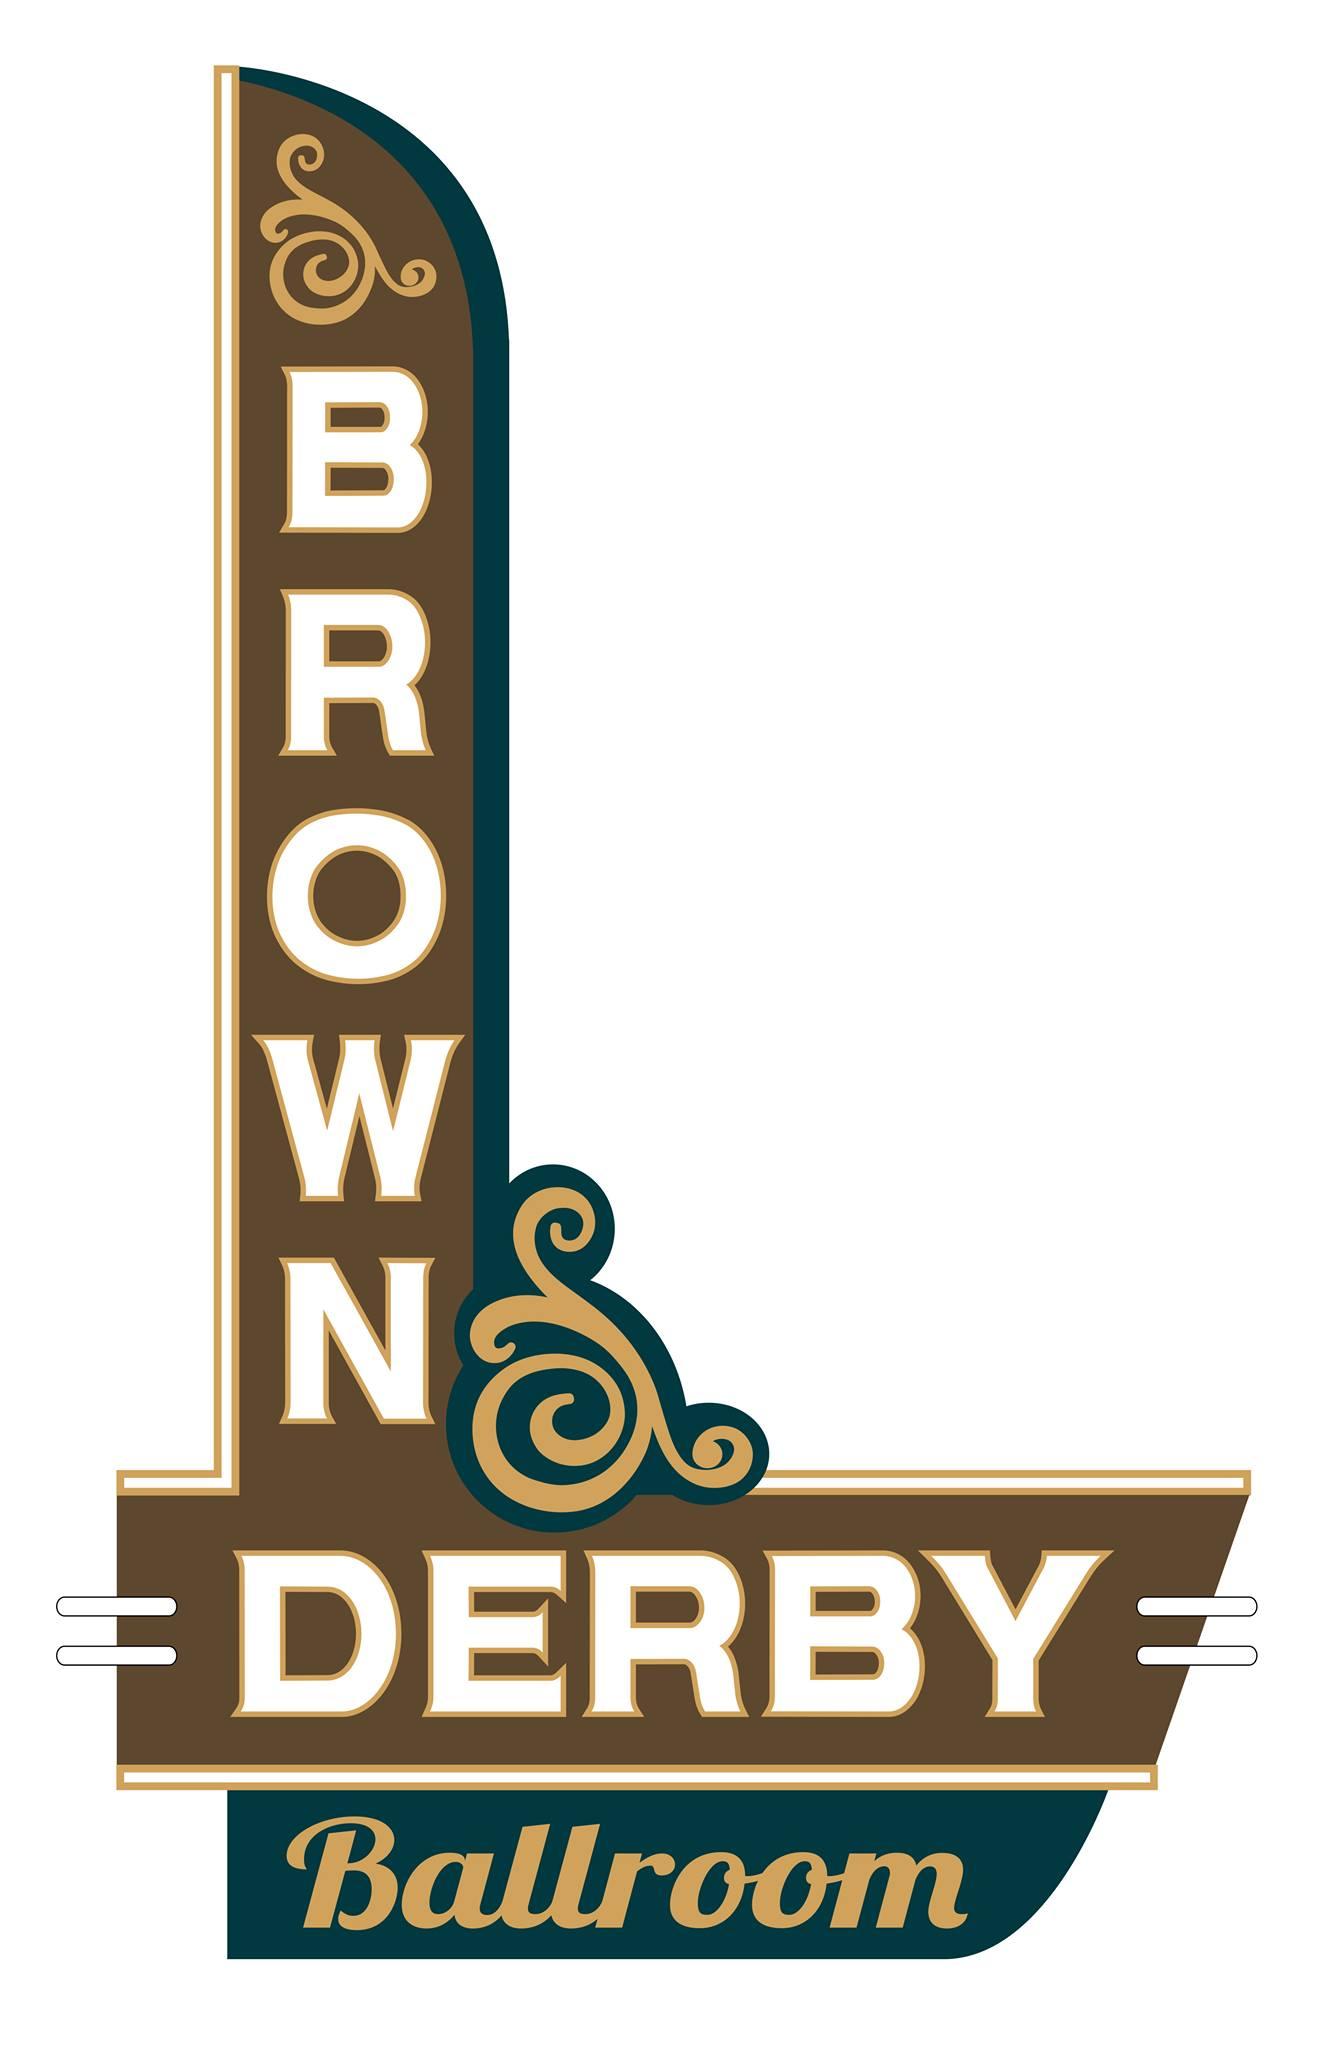 Brown Derby Ballroom.jpg